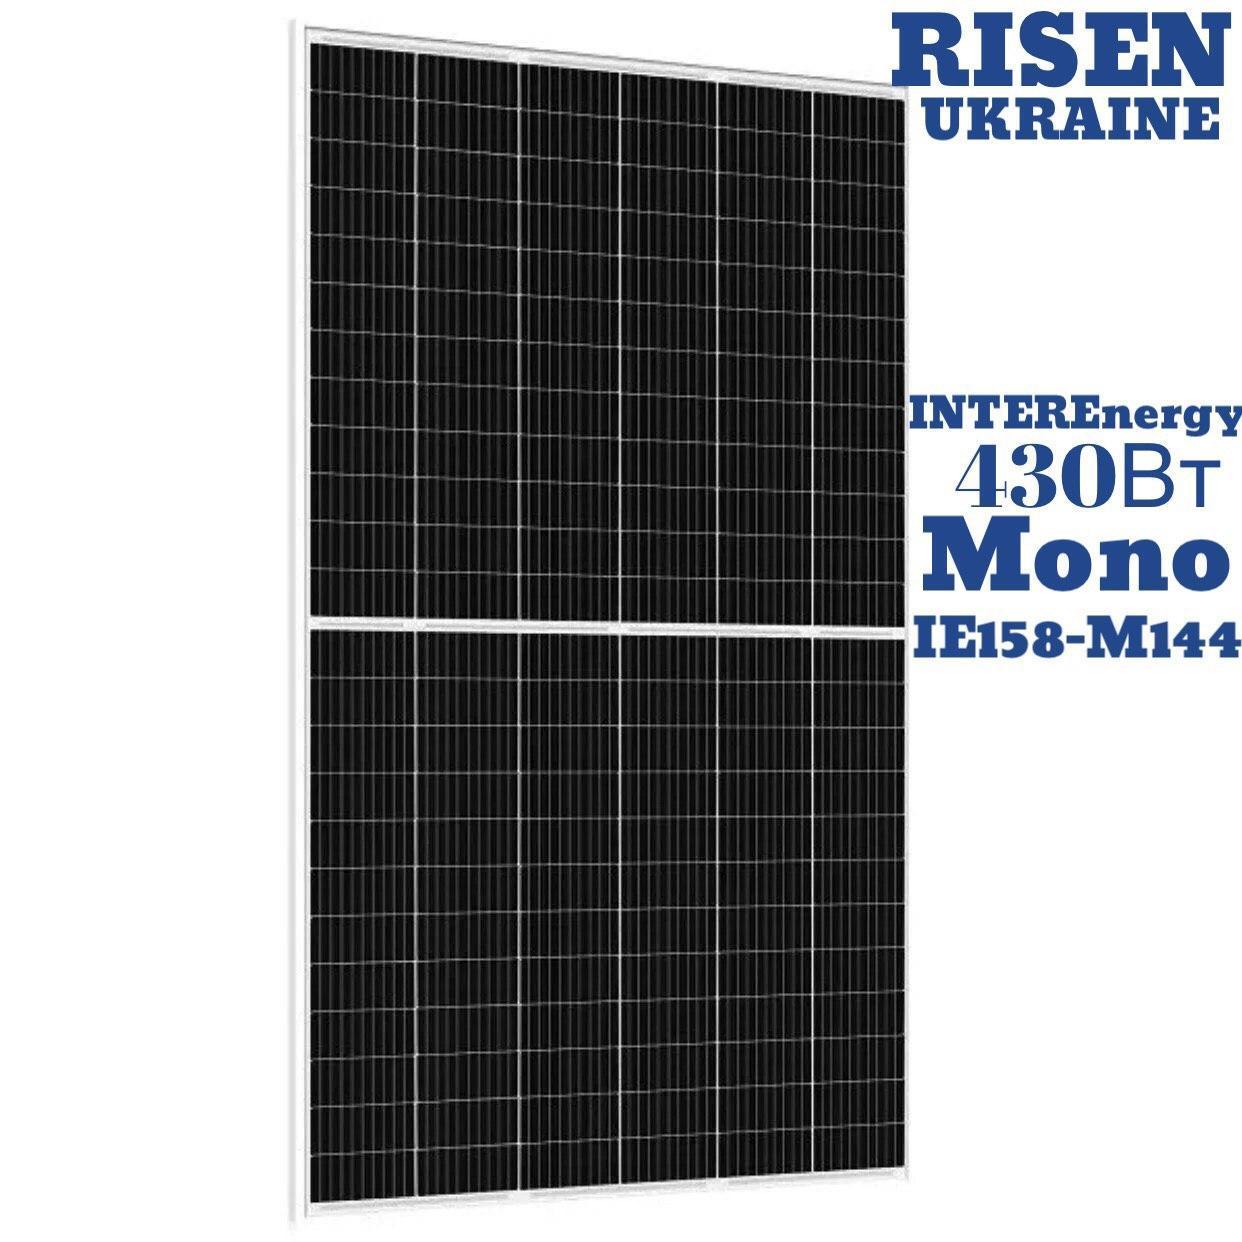 Солнечная батарея INTEREnergy IE158-M144-430W/9ВВ, 430 Вт монокристалл